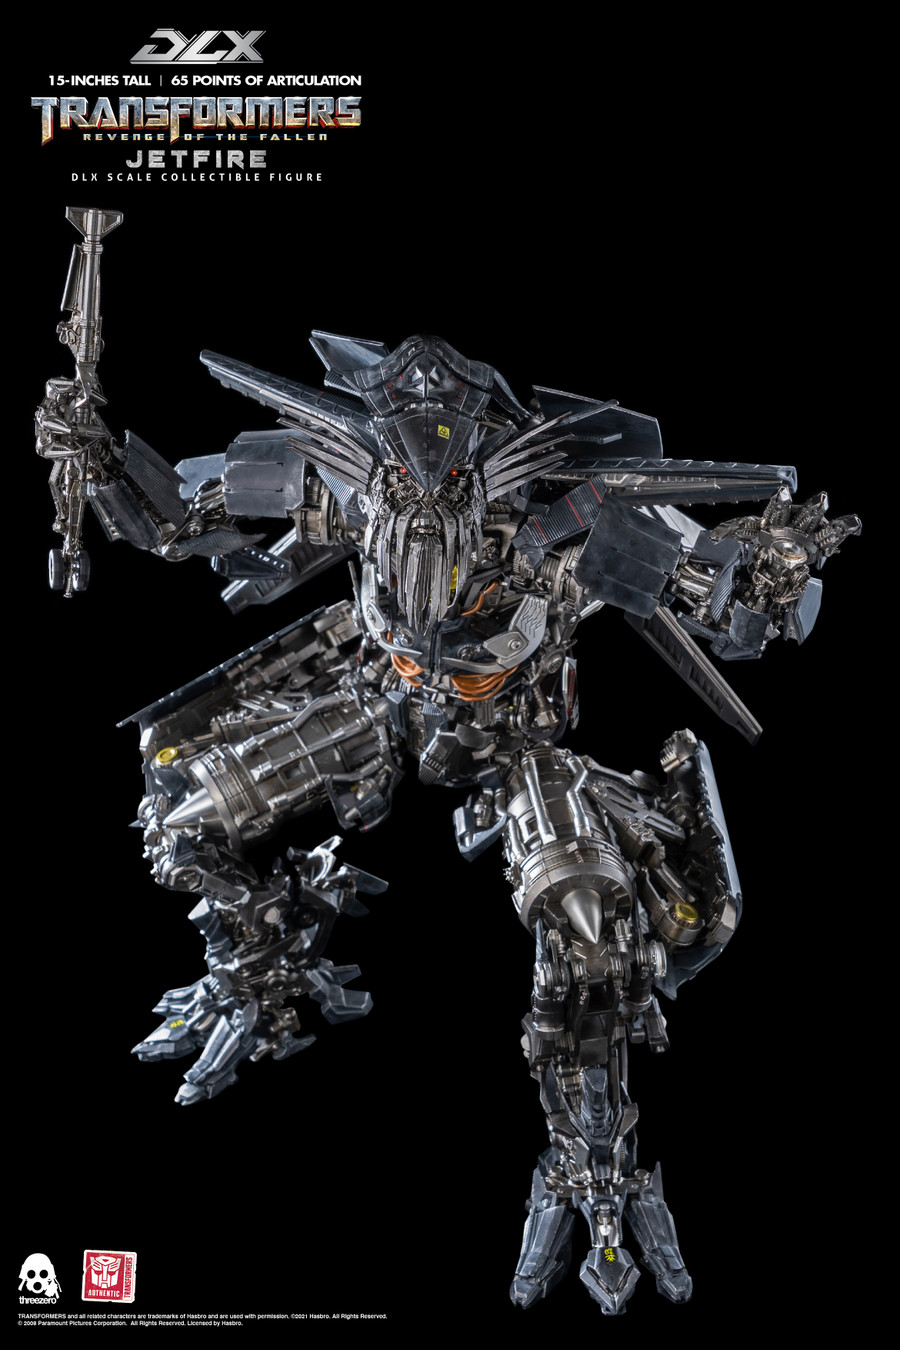 Threezero - Transformers Revenge of the Fallen – DLX Jetfire